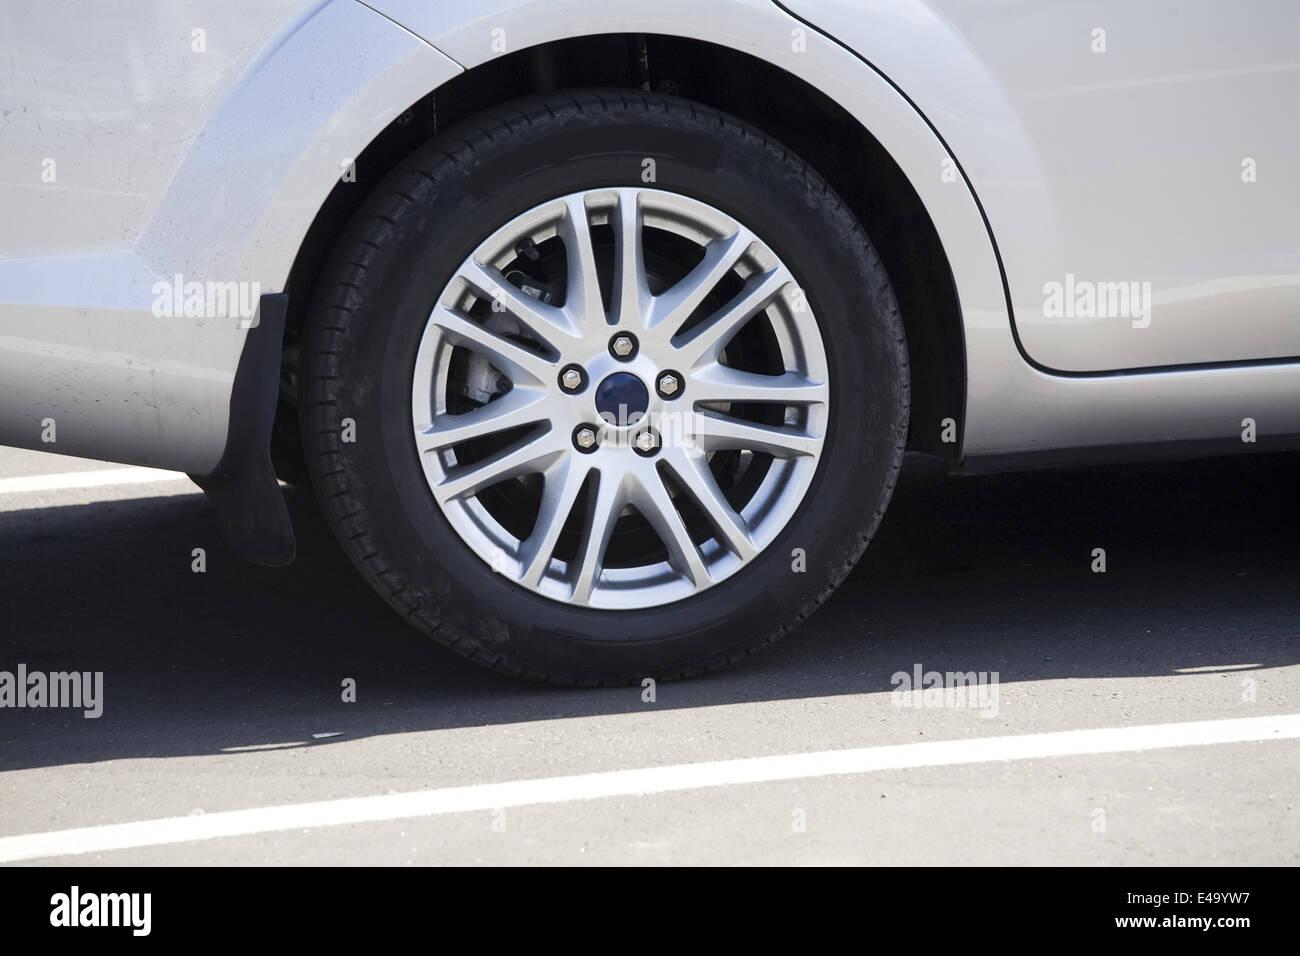 wheel modern passenger car on parking - Stock Image